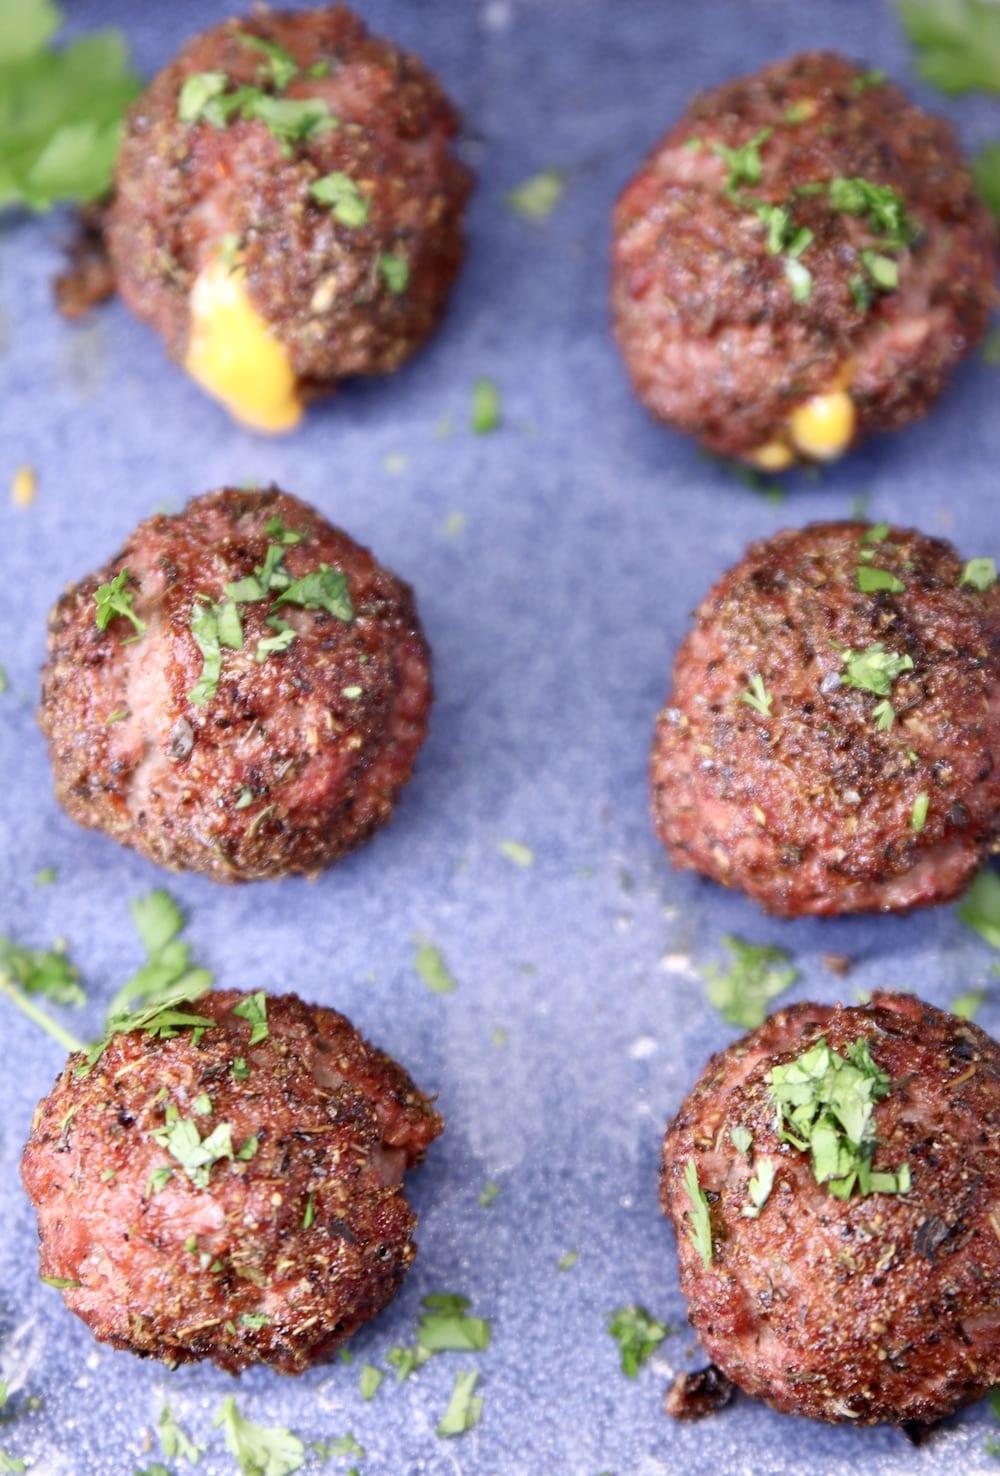 Cheddar stuffed meatballs on a blue platter